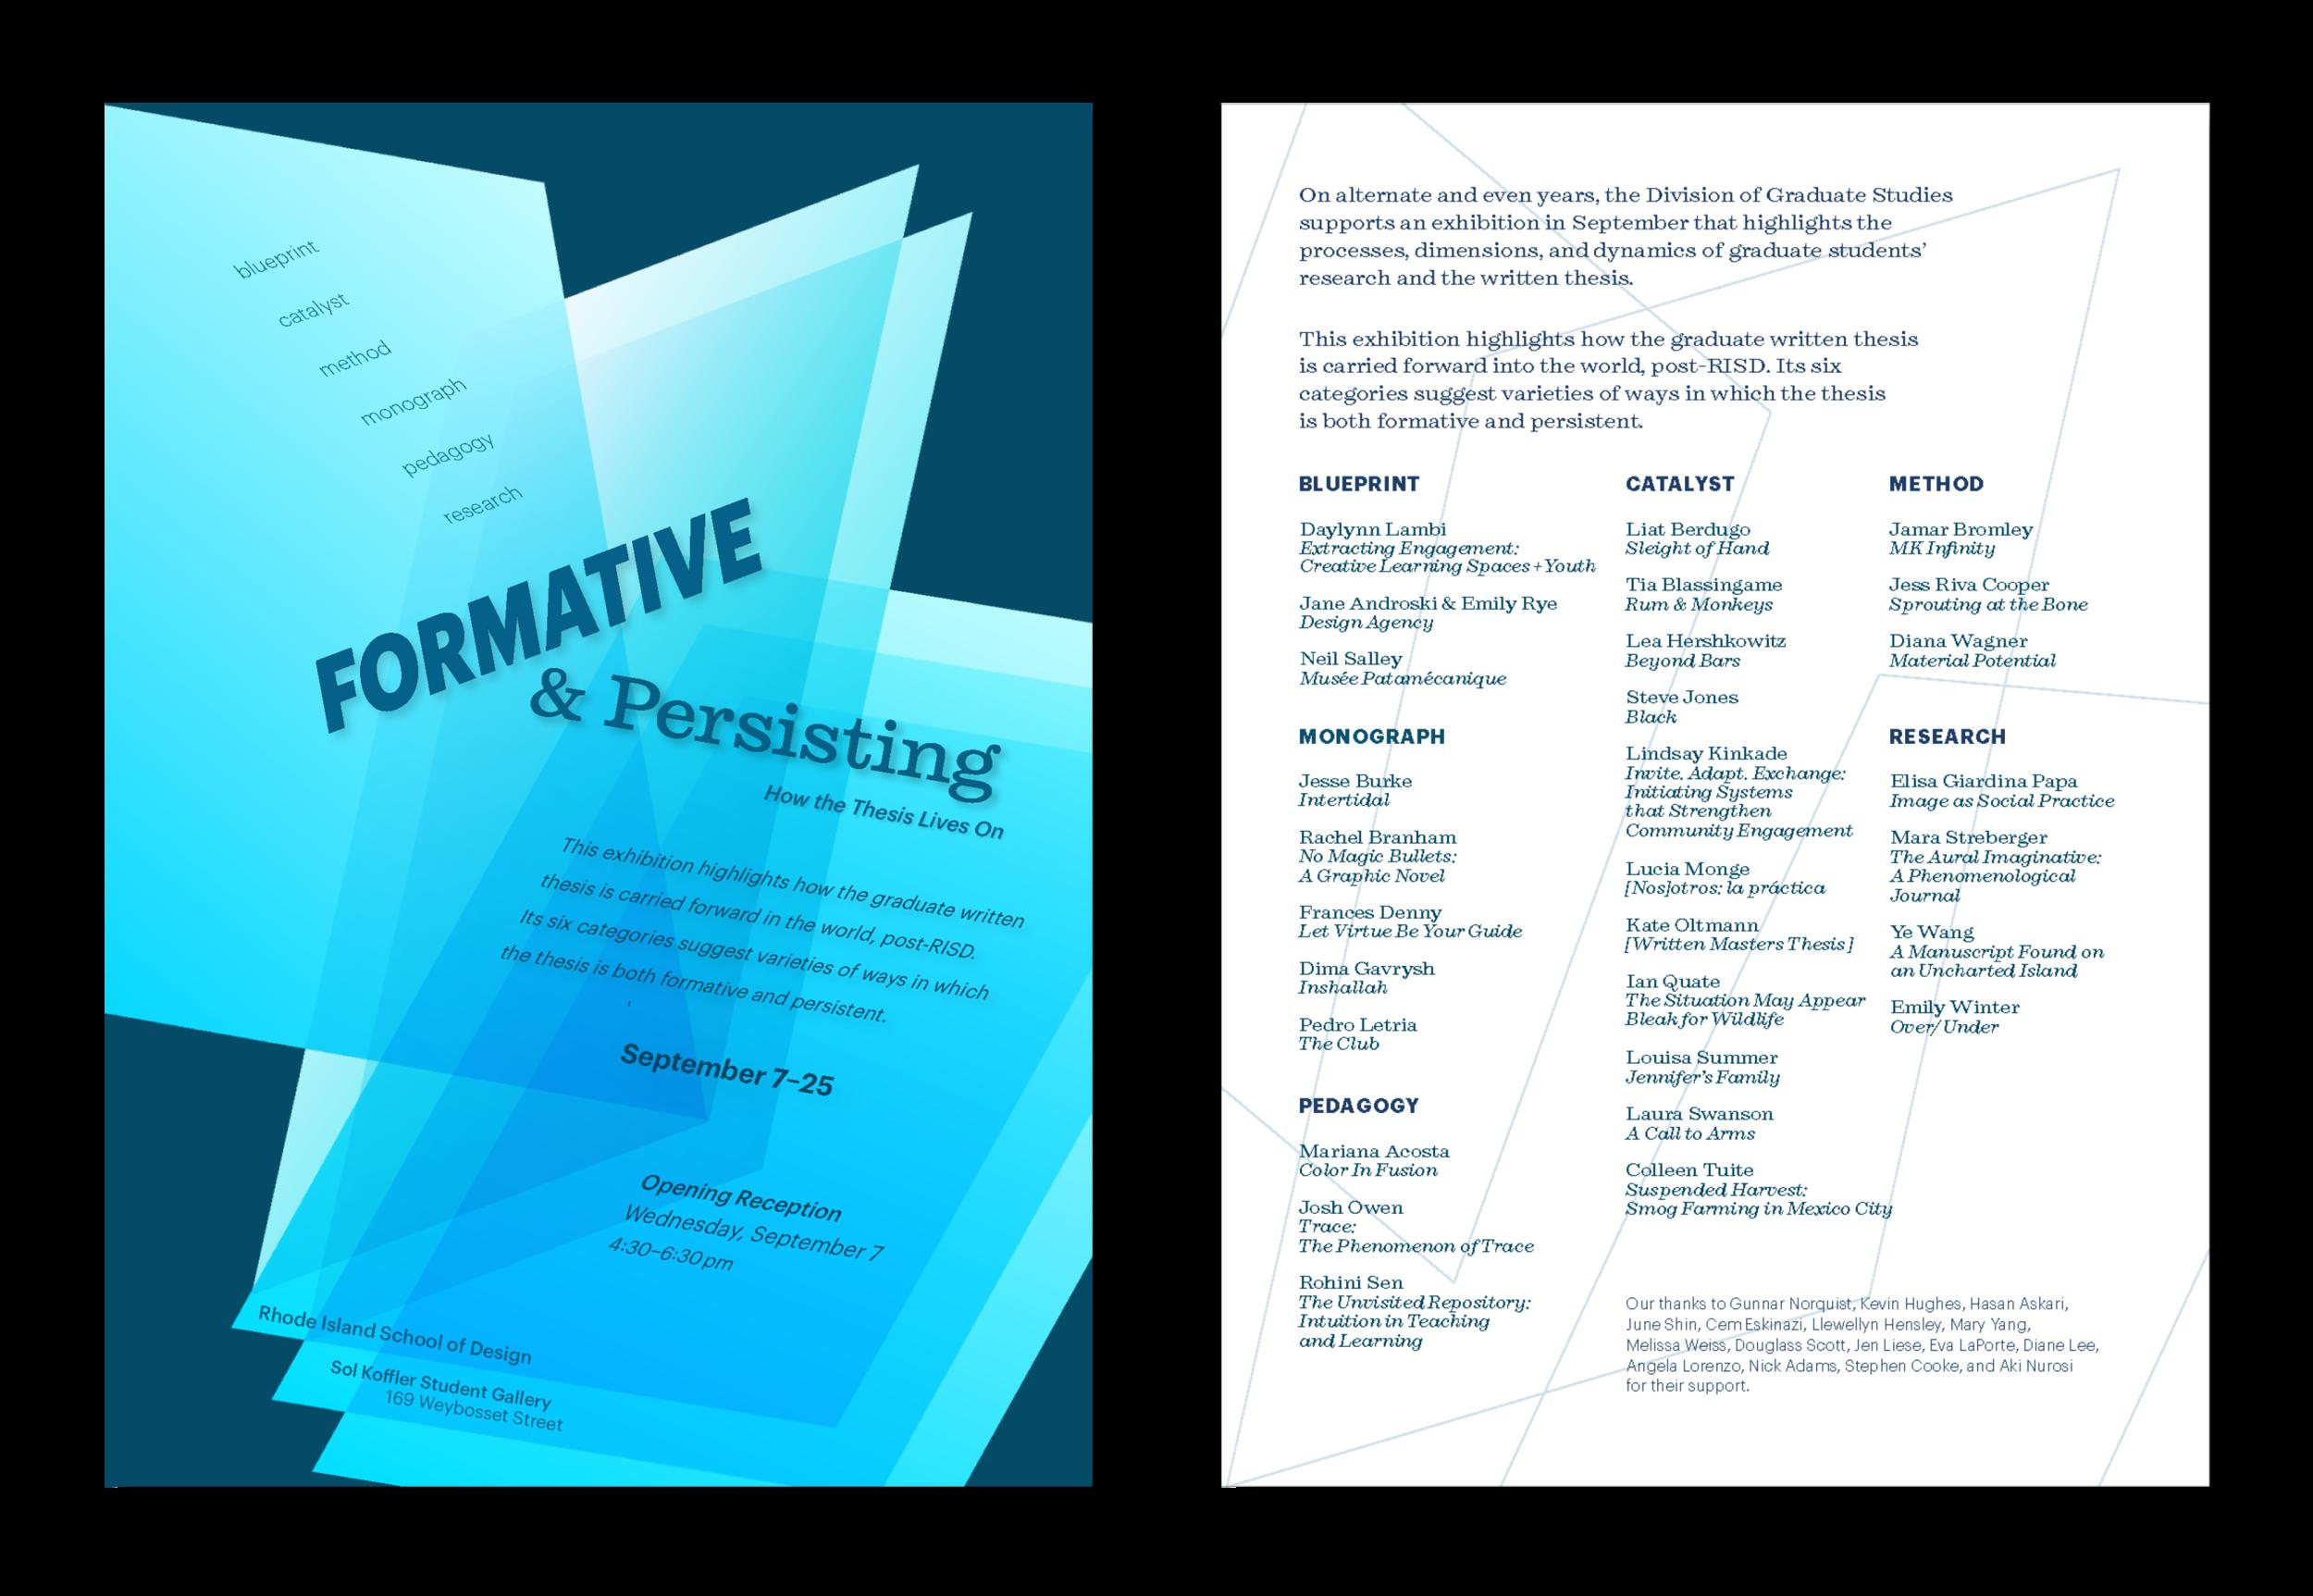 formative_persisting_postcard_web.png